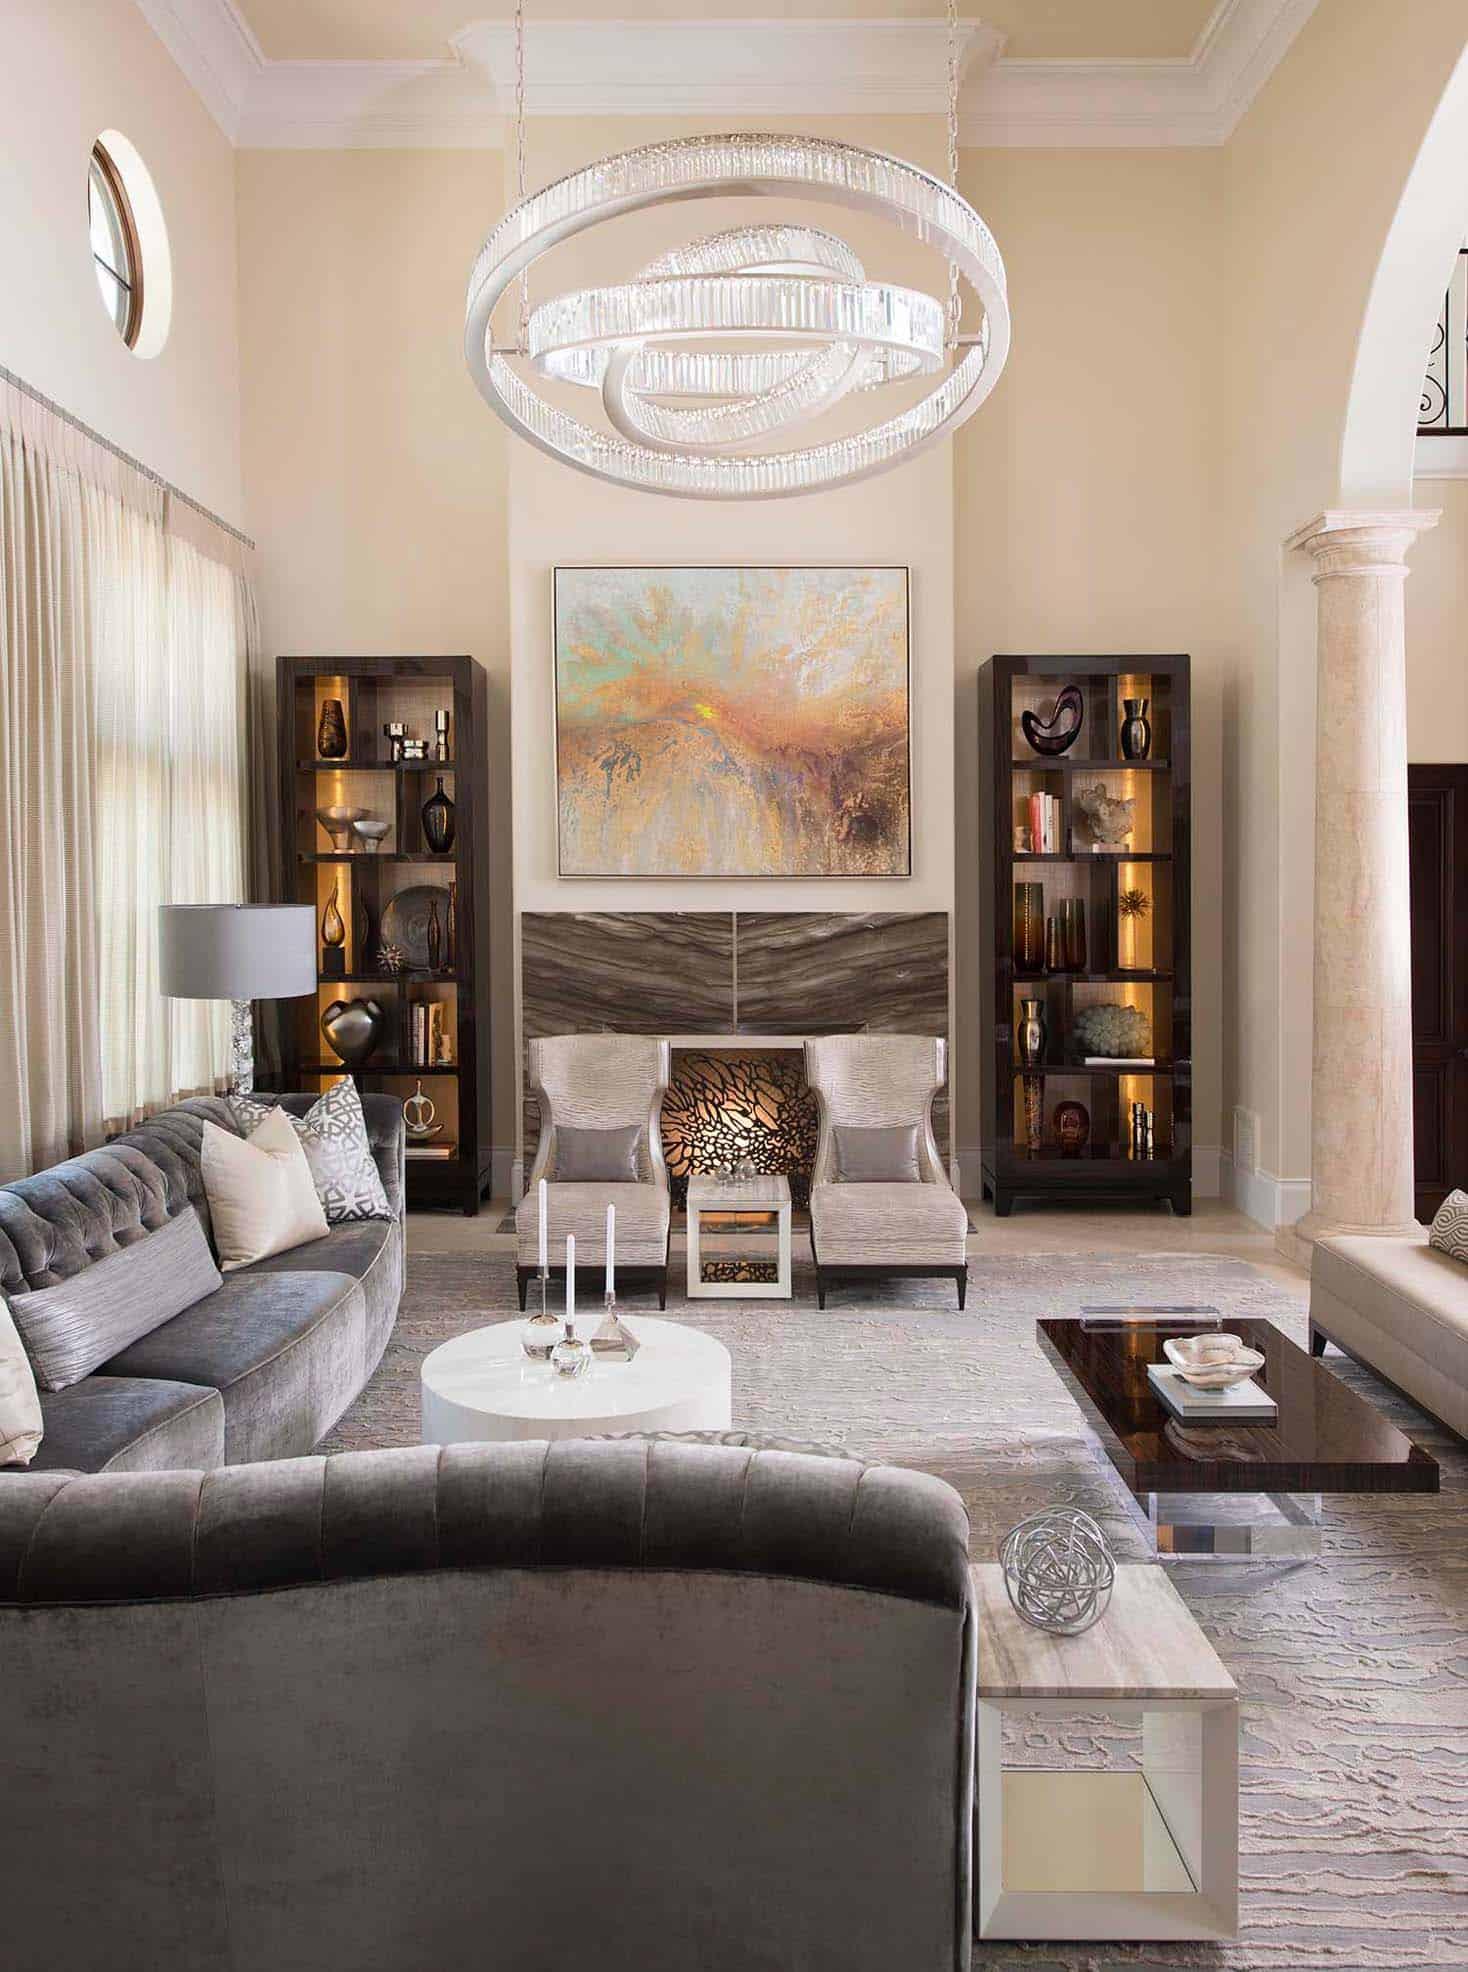 Contemporary Style Home-Dallas Design Group-01-1 Kindesign